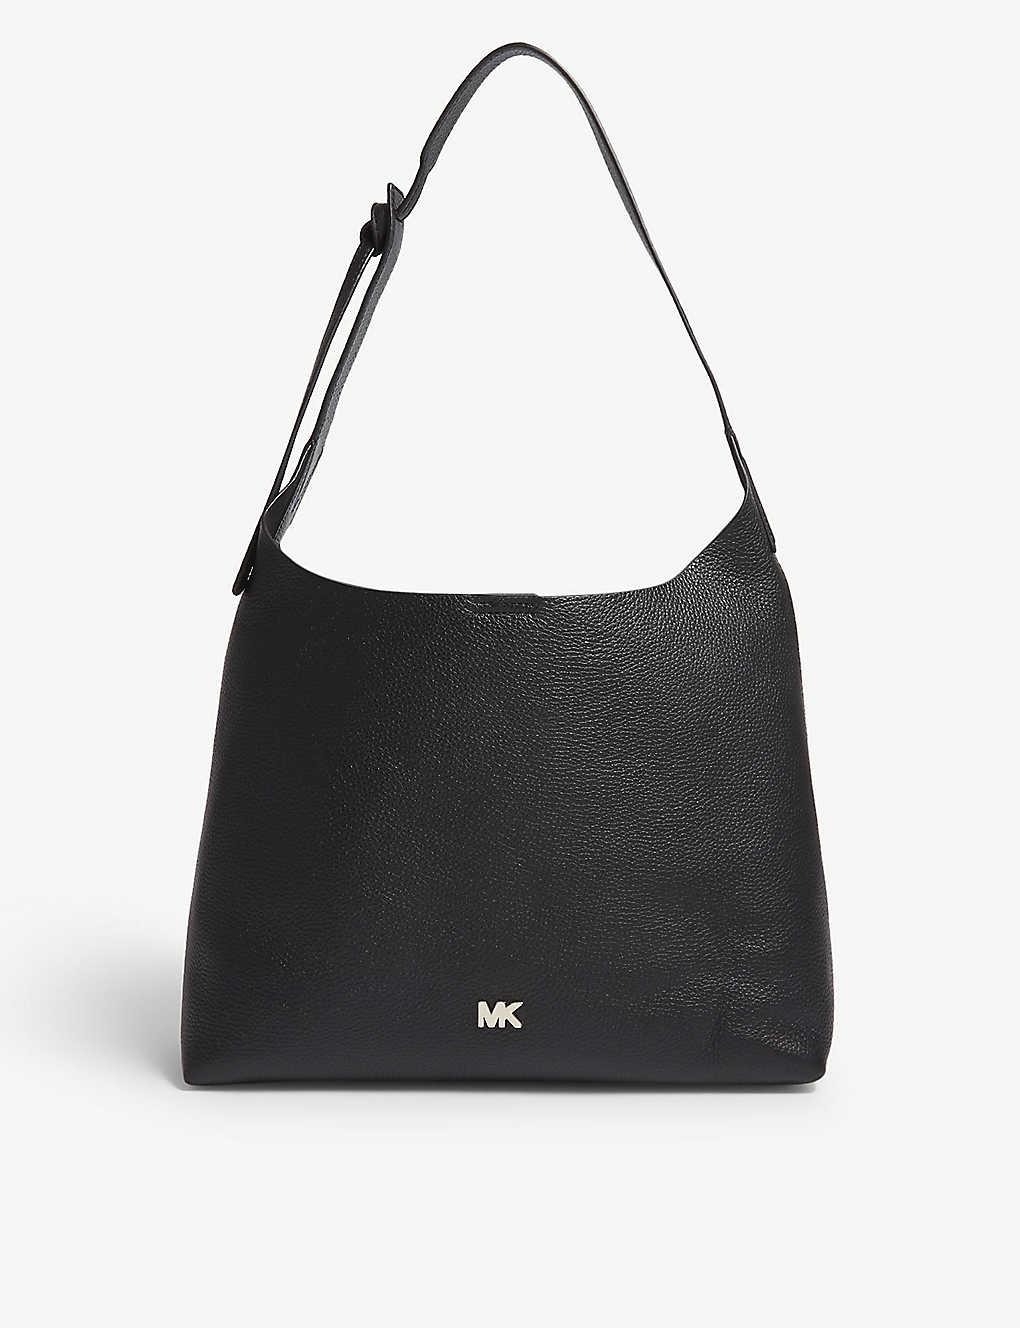 4f033f9abcfc MICHAEL MICHAEL KORS - Junie leather hobo bag | Selfridges.com